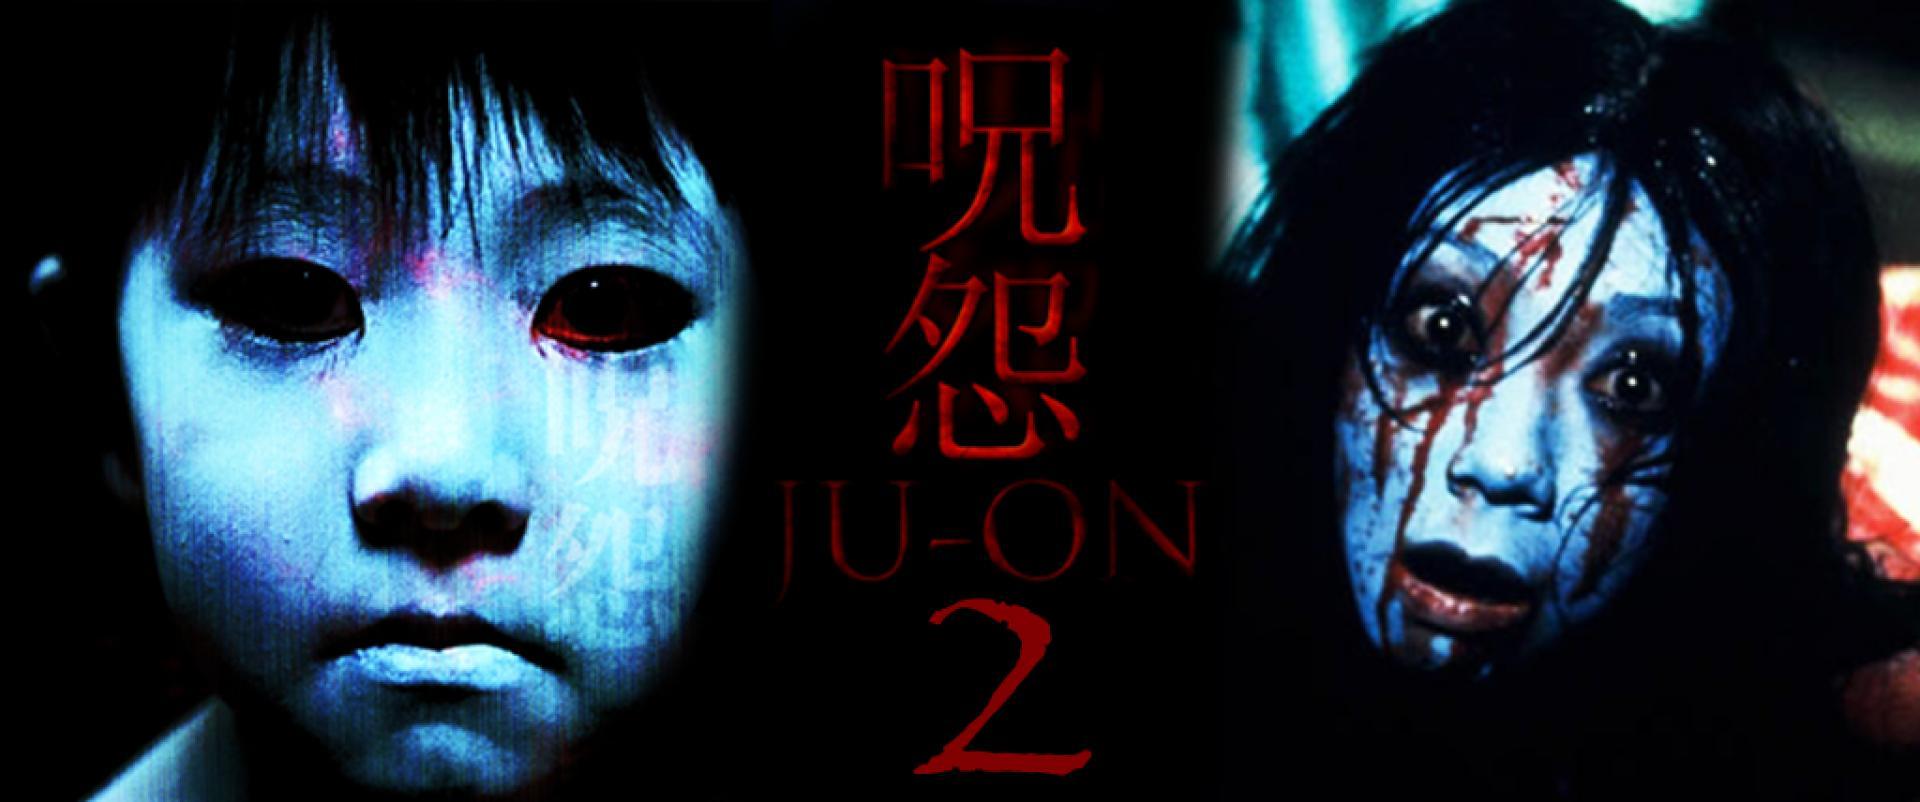 Ju-on Part 2 (2002/2003)